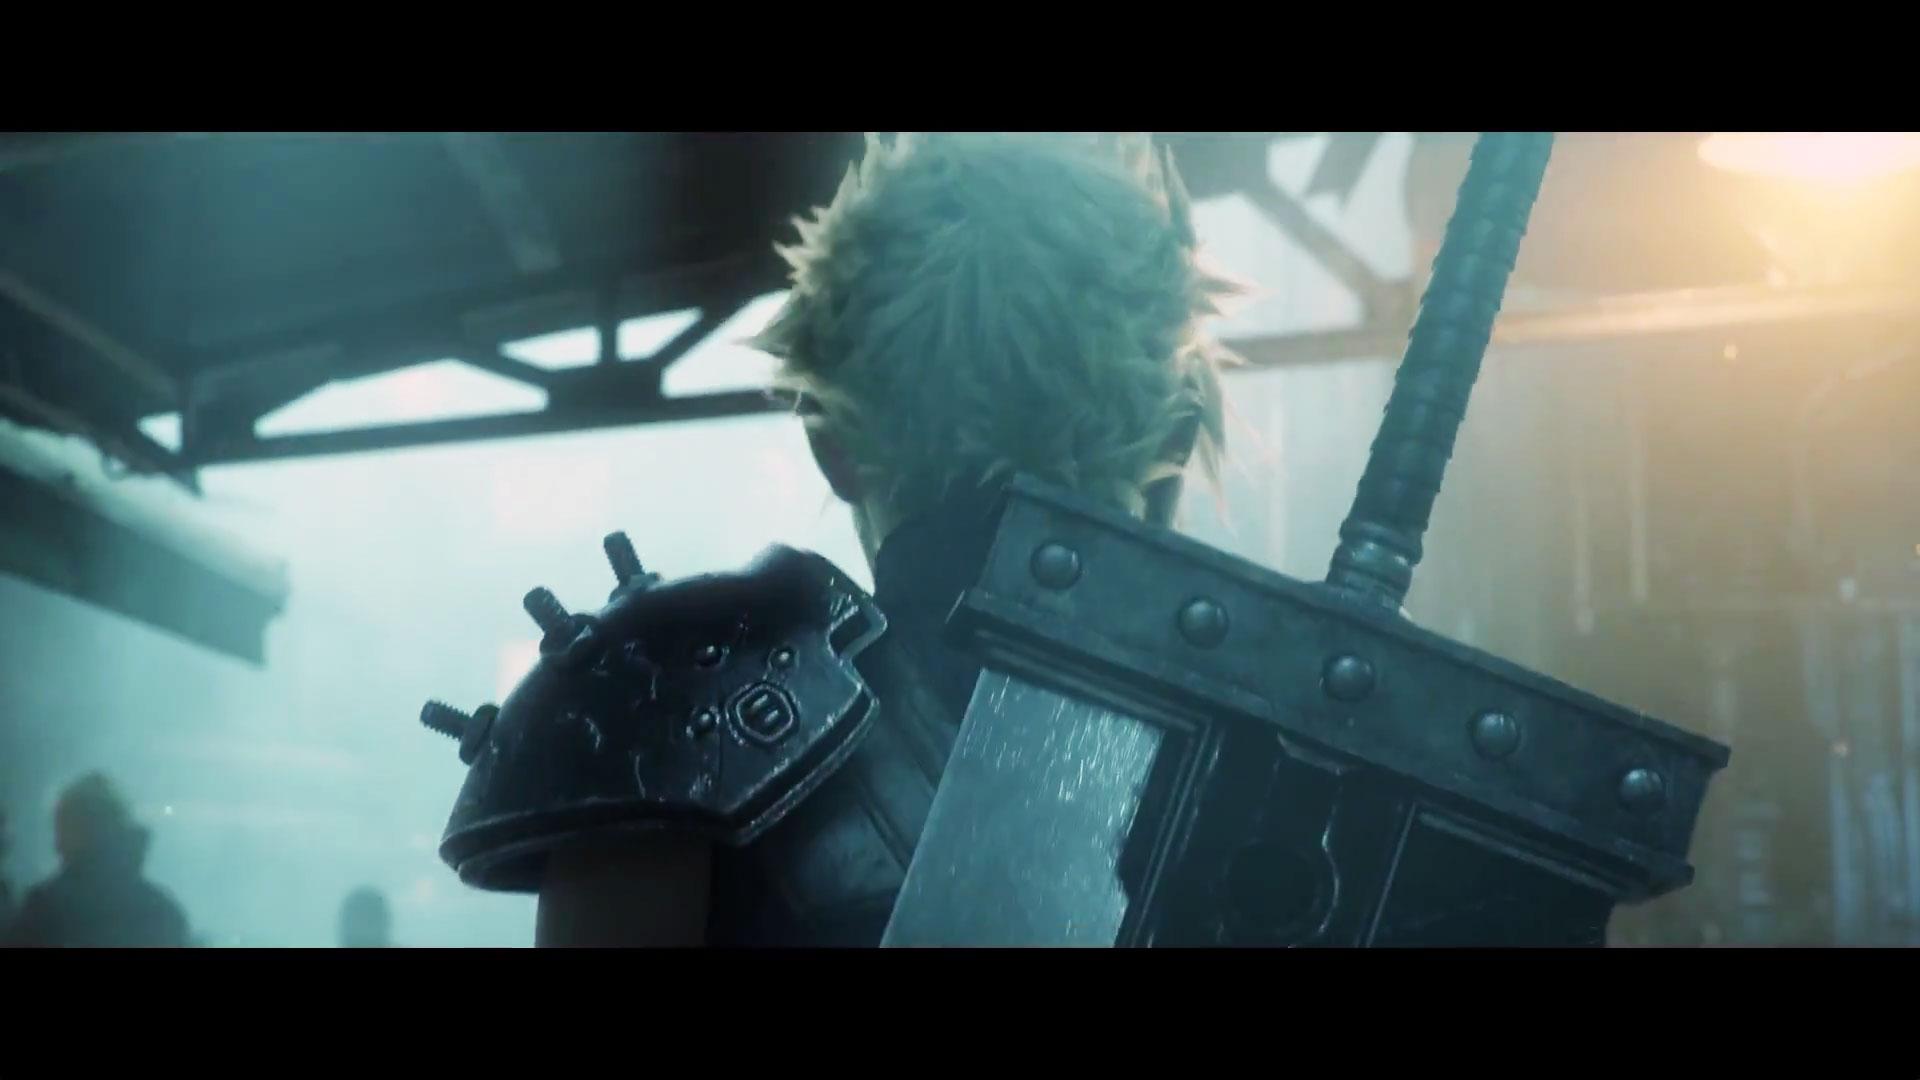 Finally a Final Fantasy VII Remake 1920x1080